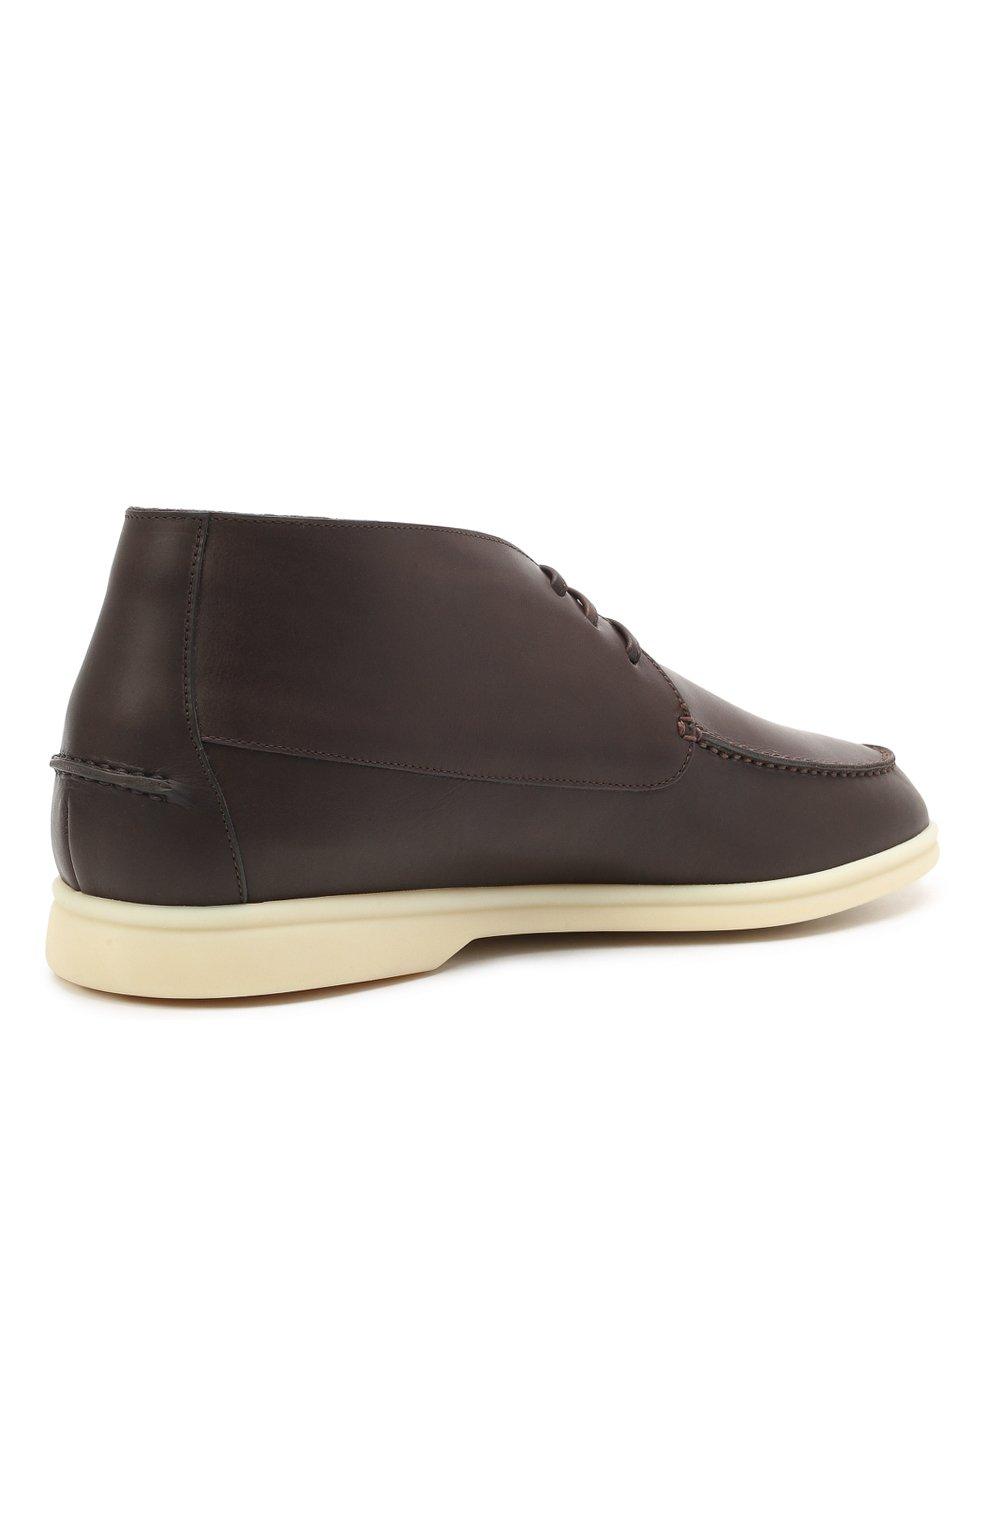 Мужские кожаные ботинки sailing walk LORO PIANA темно-коричневого цвета, арт. FAL6183 | Фото 4